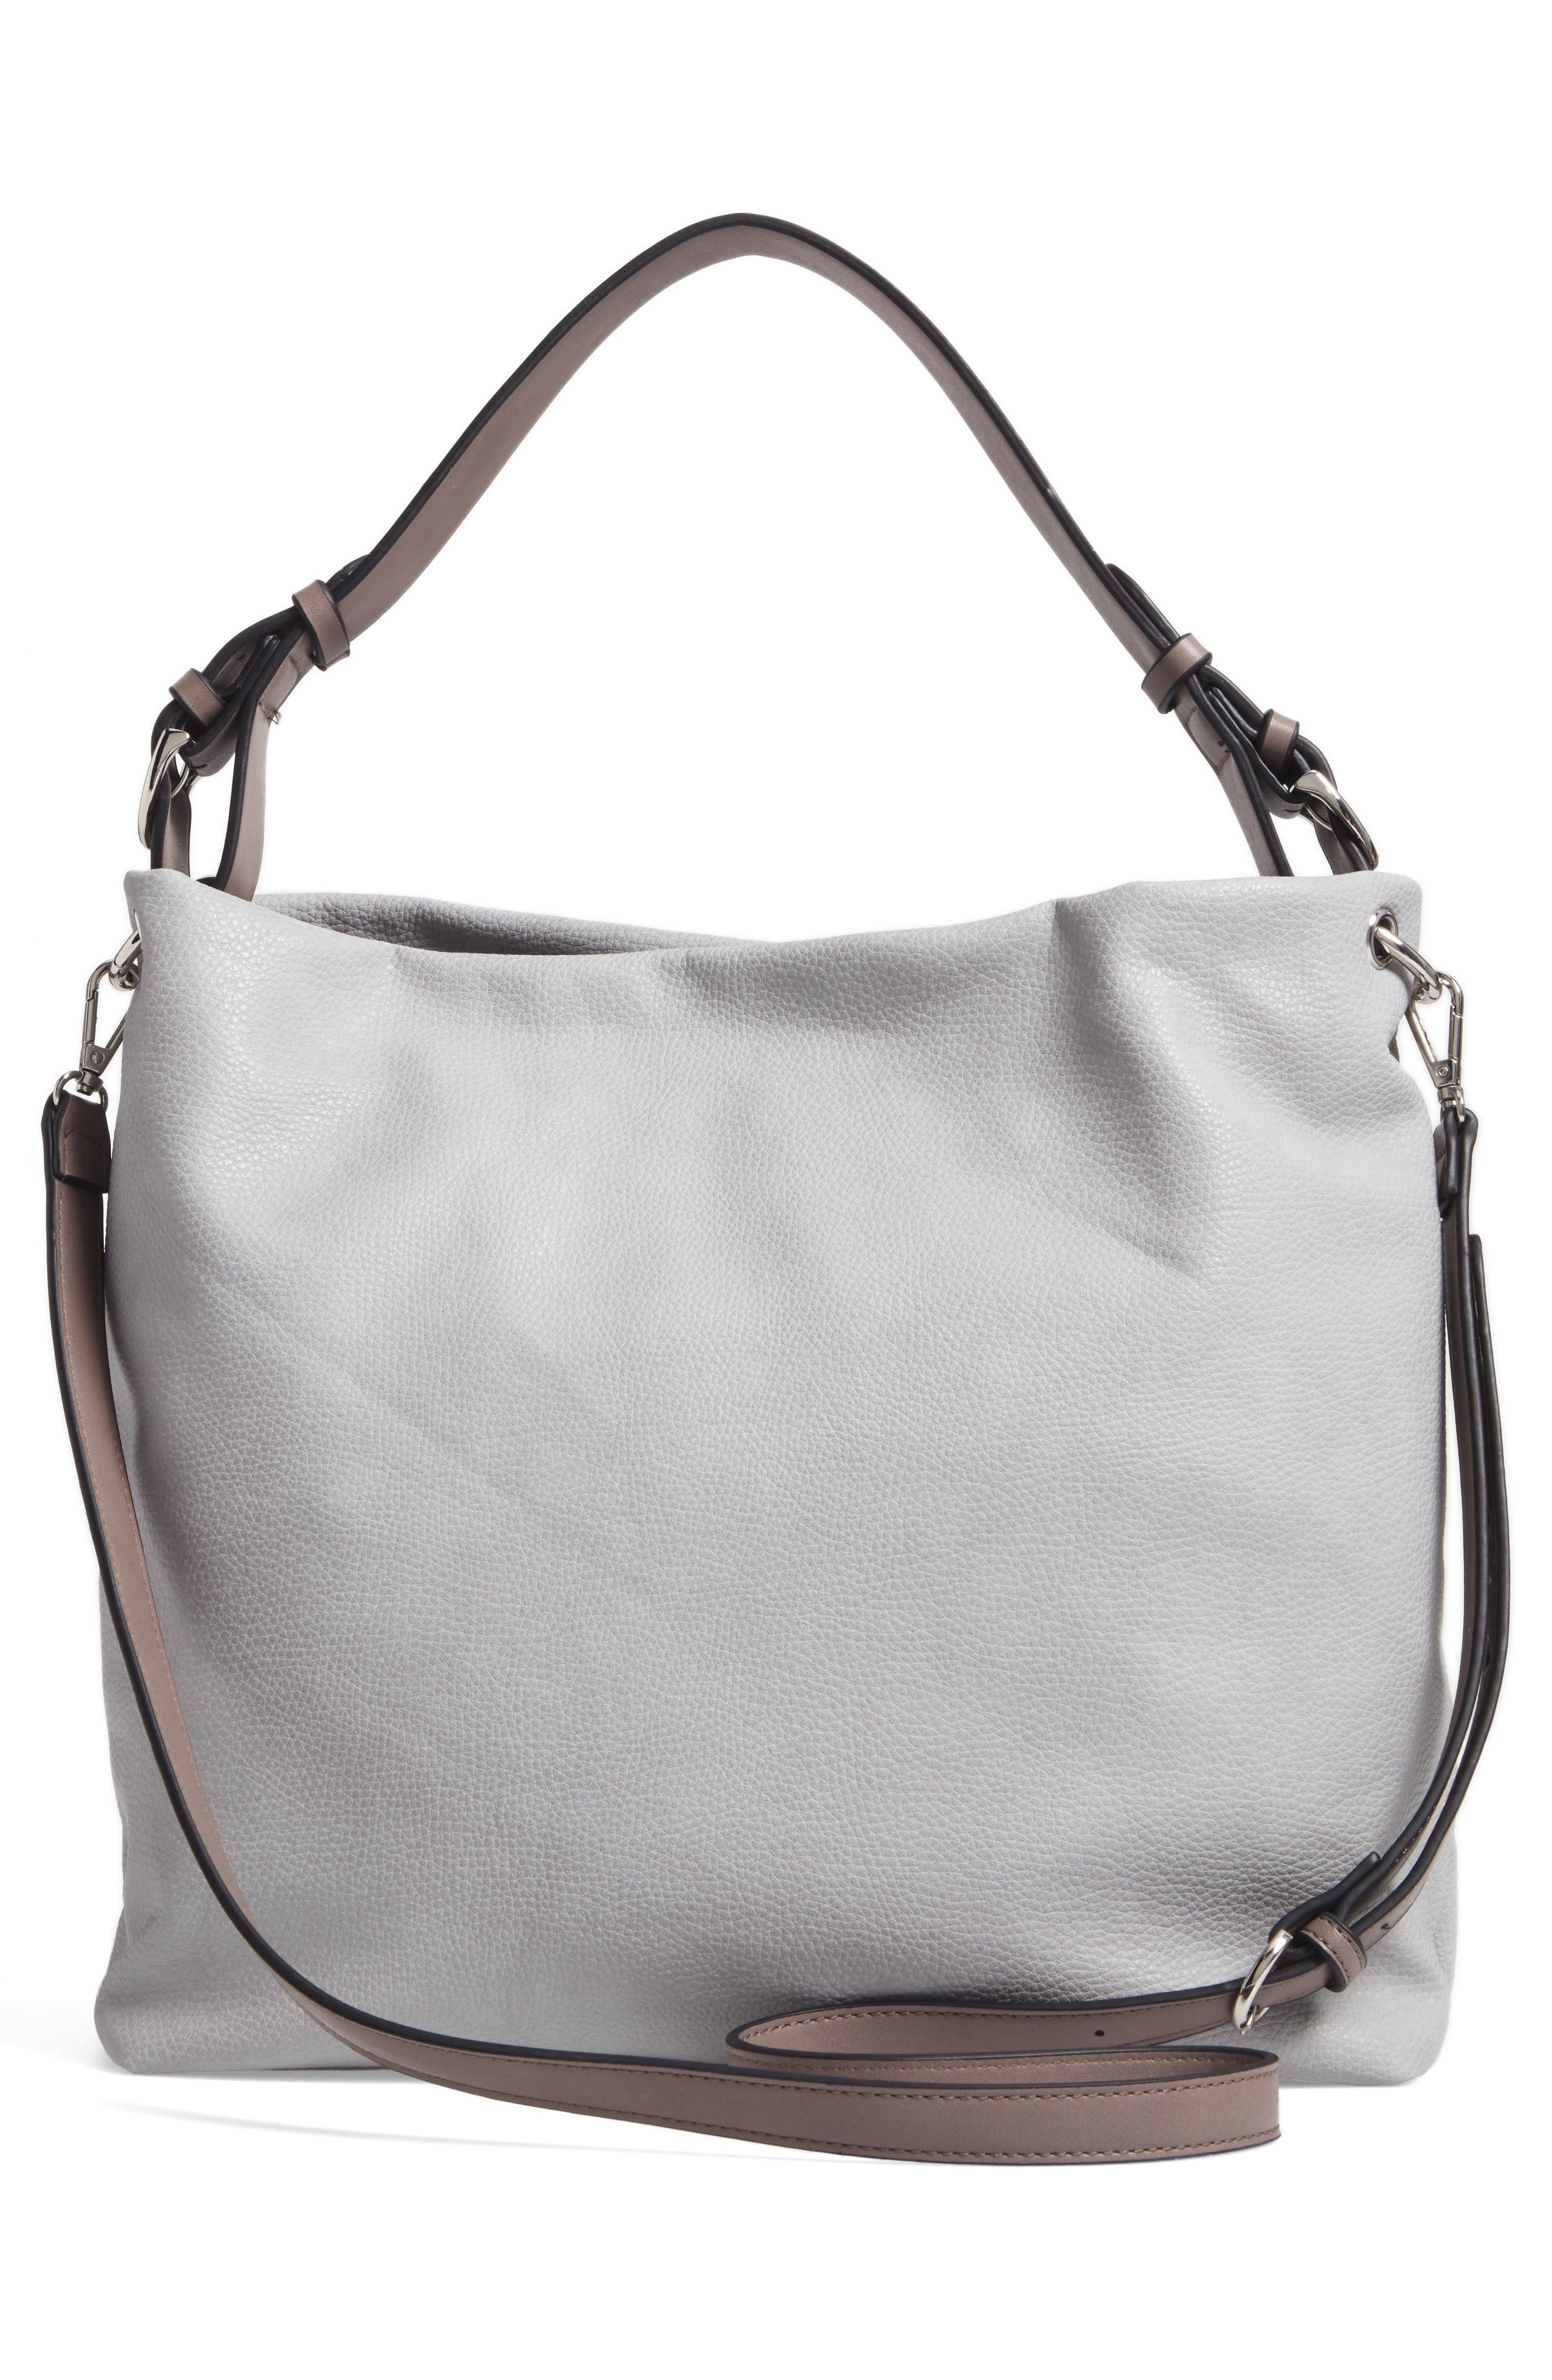 Taylor Faux Leather Shoulder Bag,                             Alternate thumbnail 8, color,